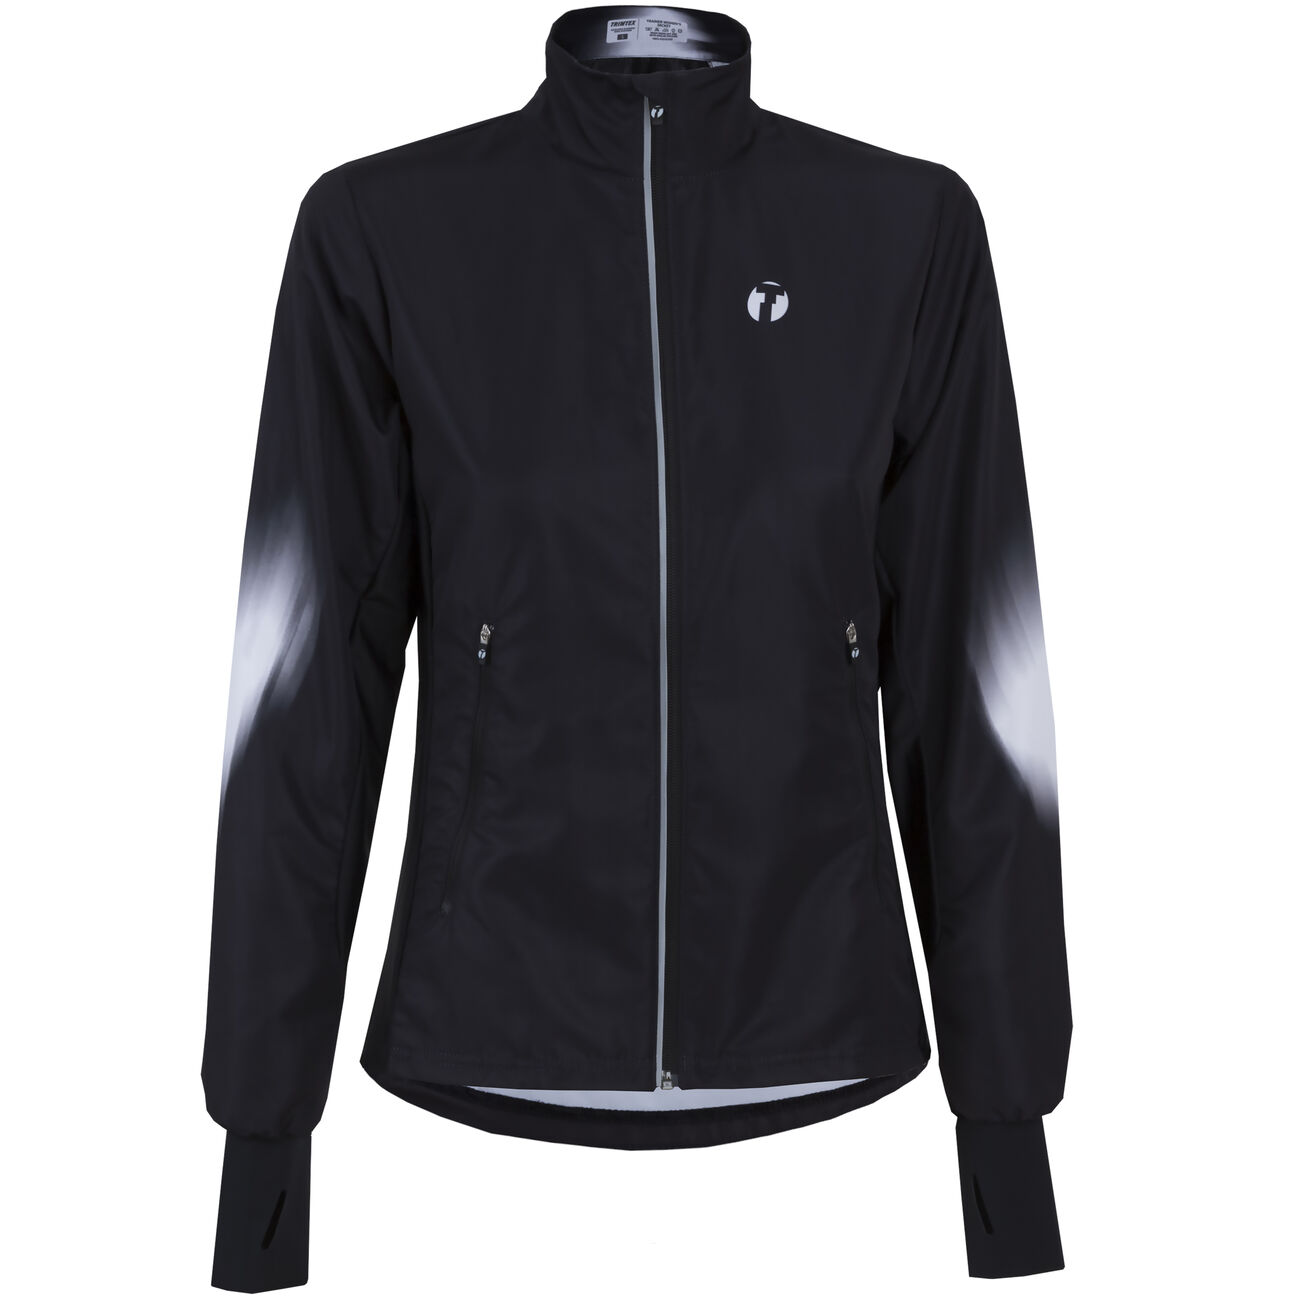 Trainer training jacket women's